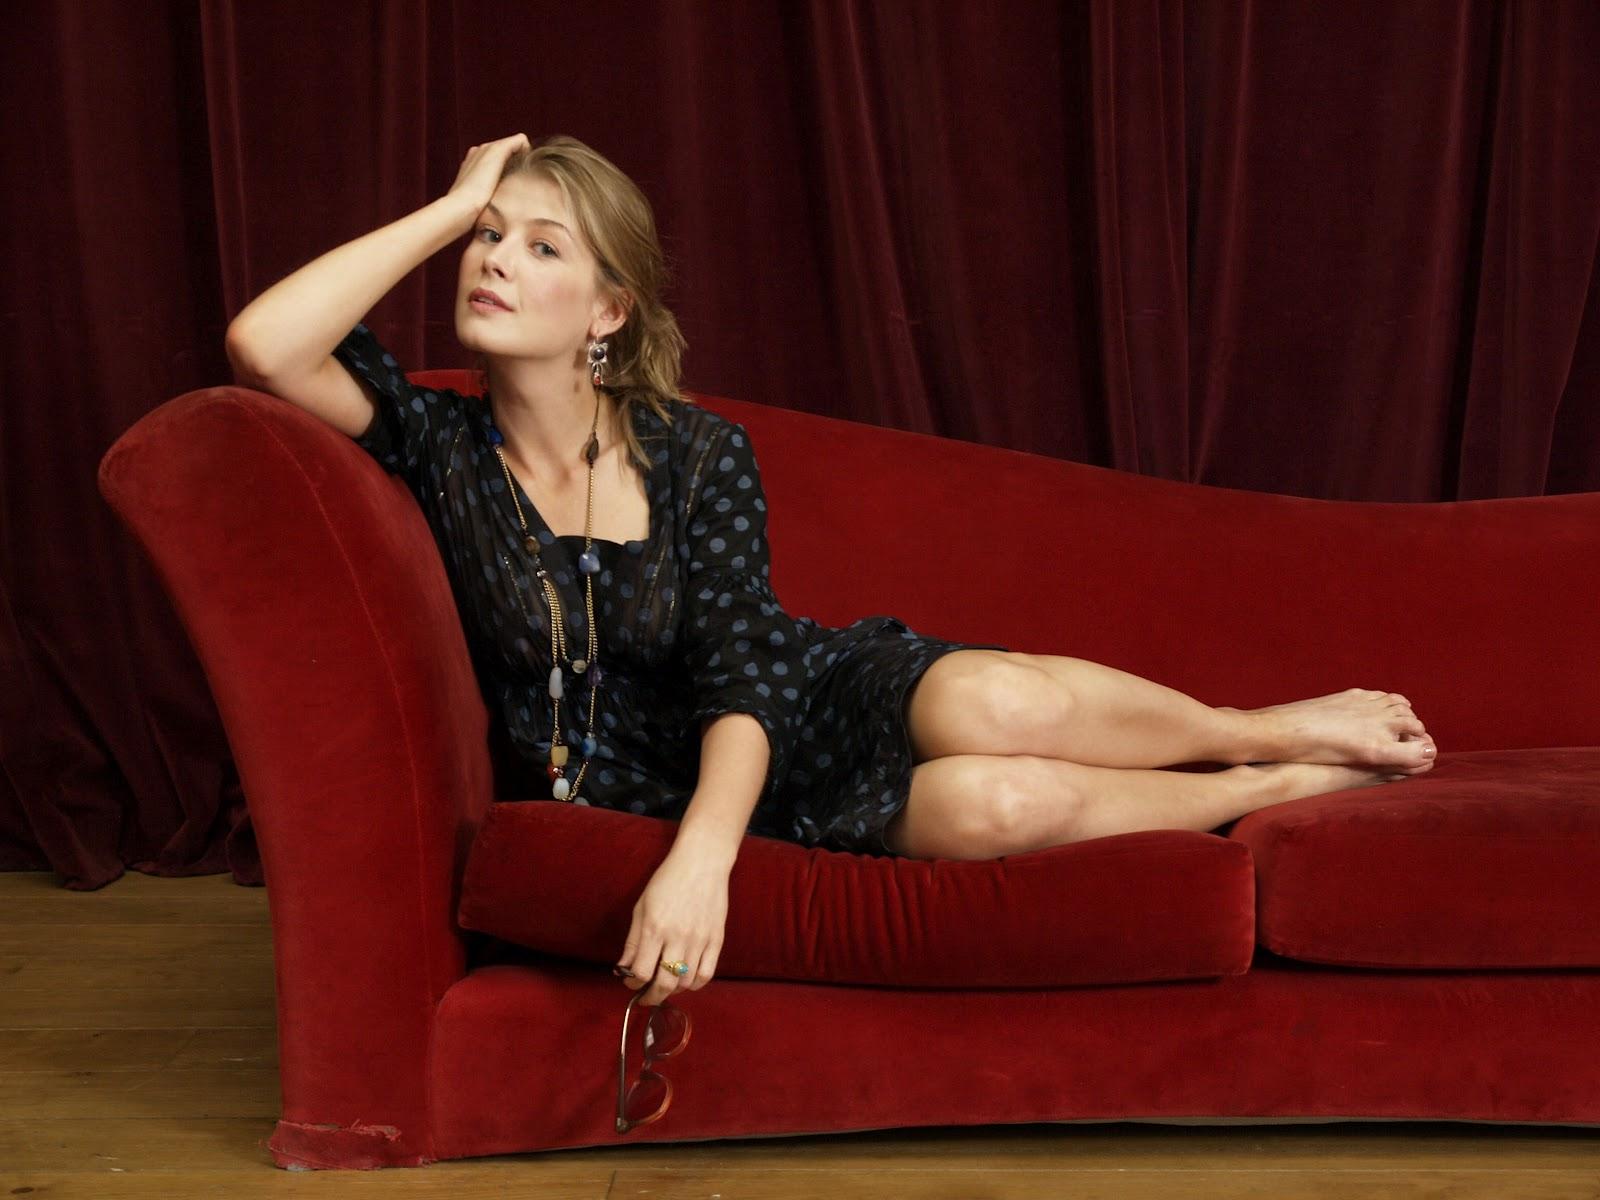 Rosamund Pike Celebrity Pictures